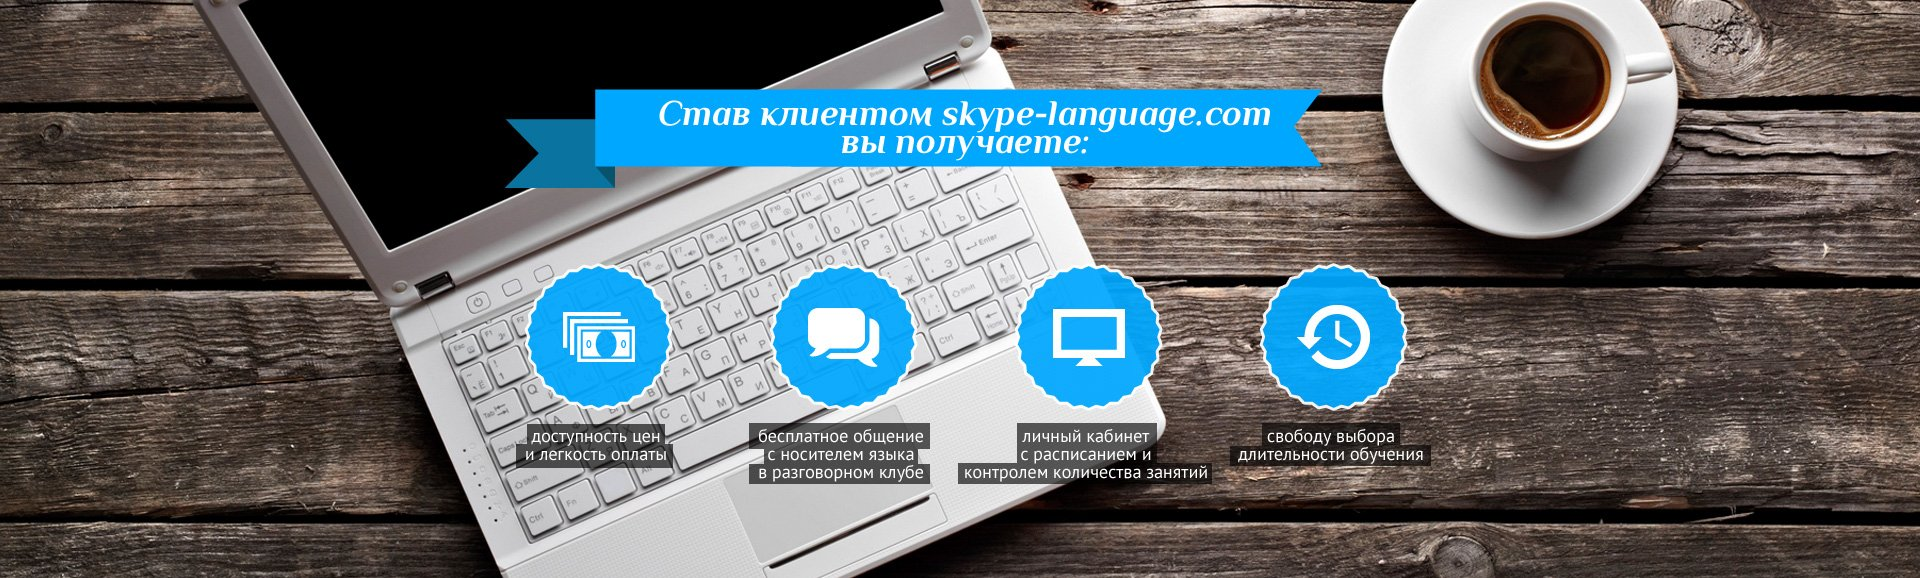 Чат по скайпу онлайн бесплатно 1 фотография